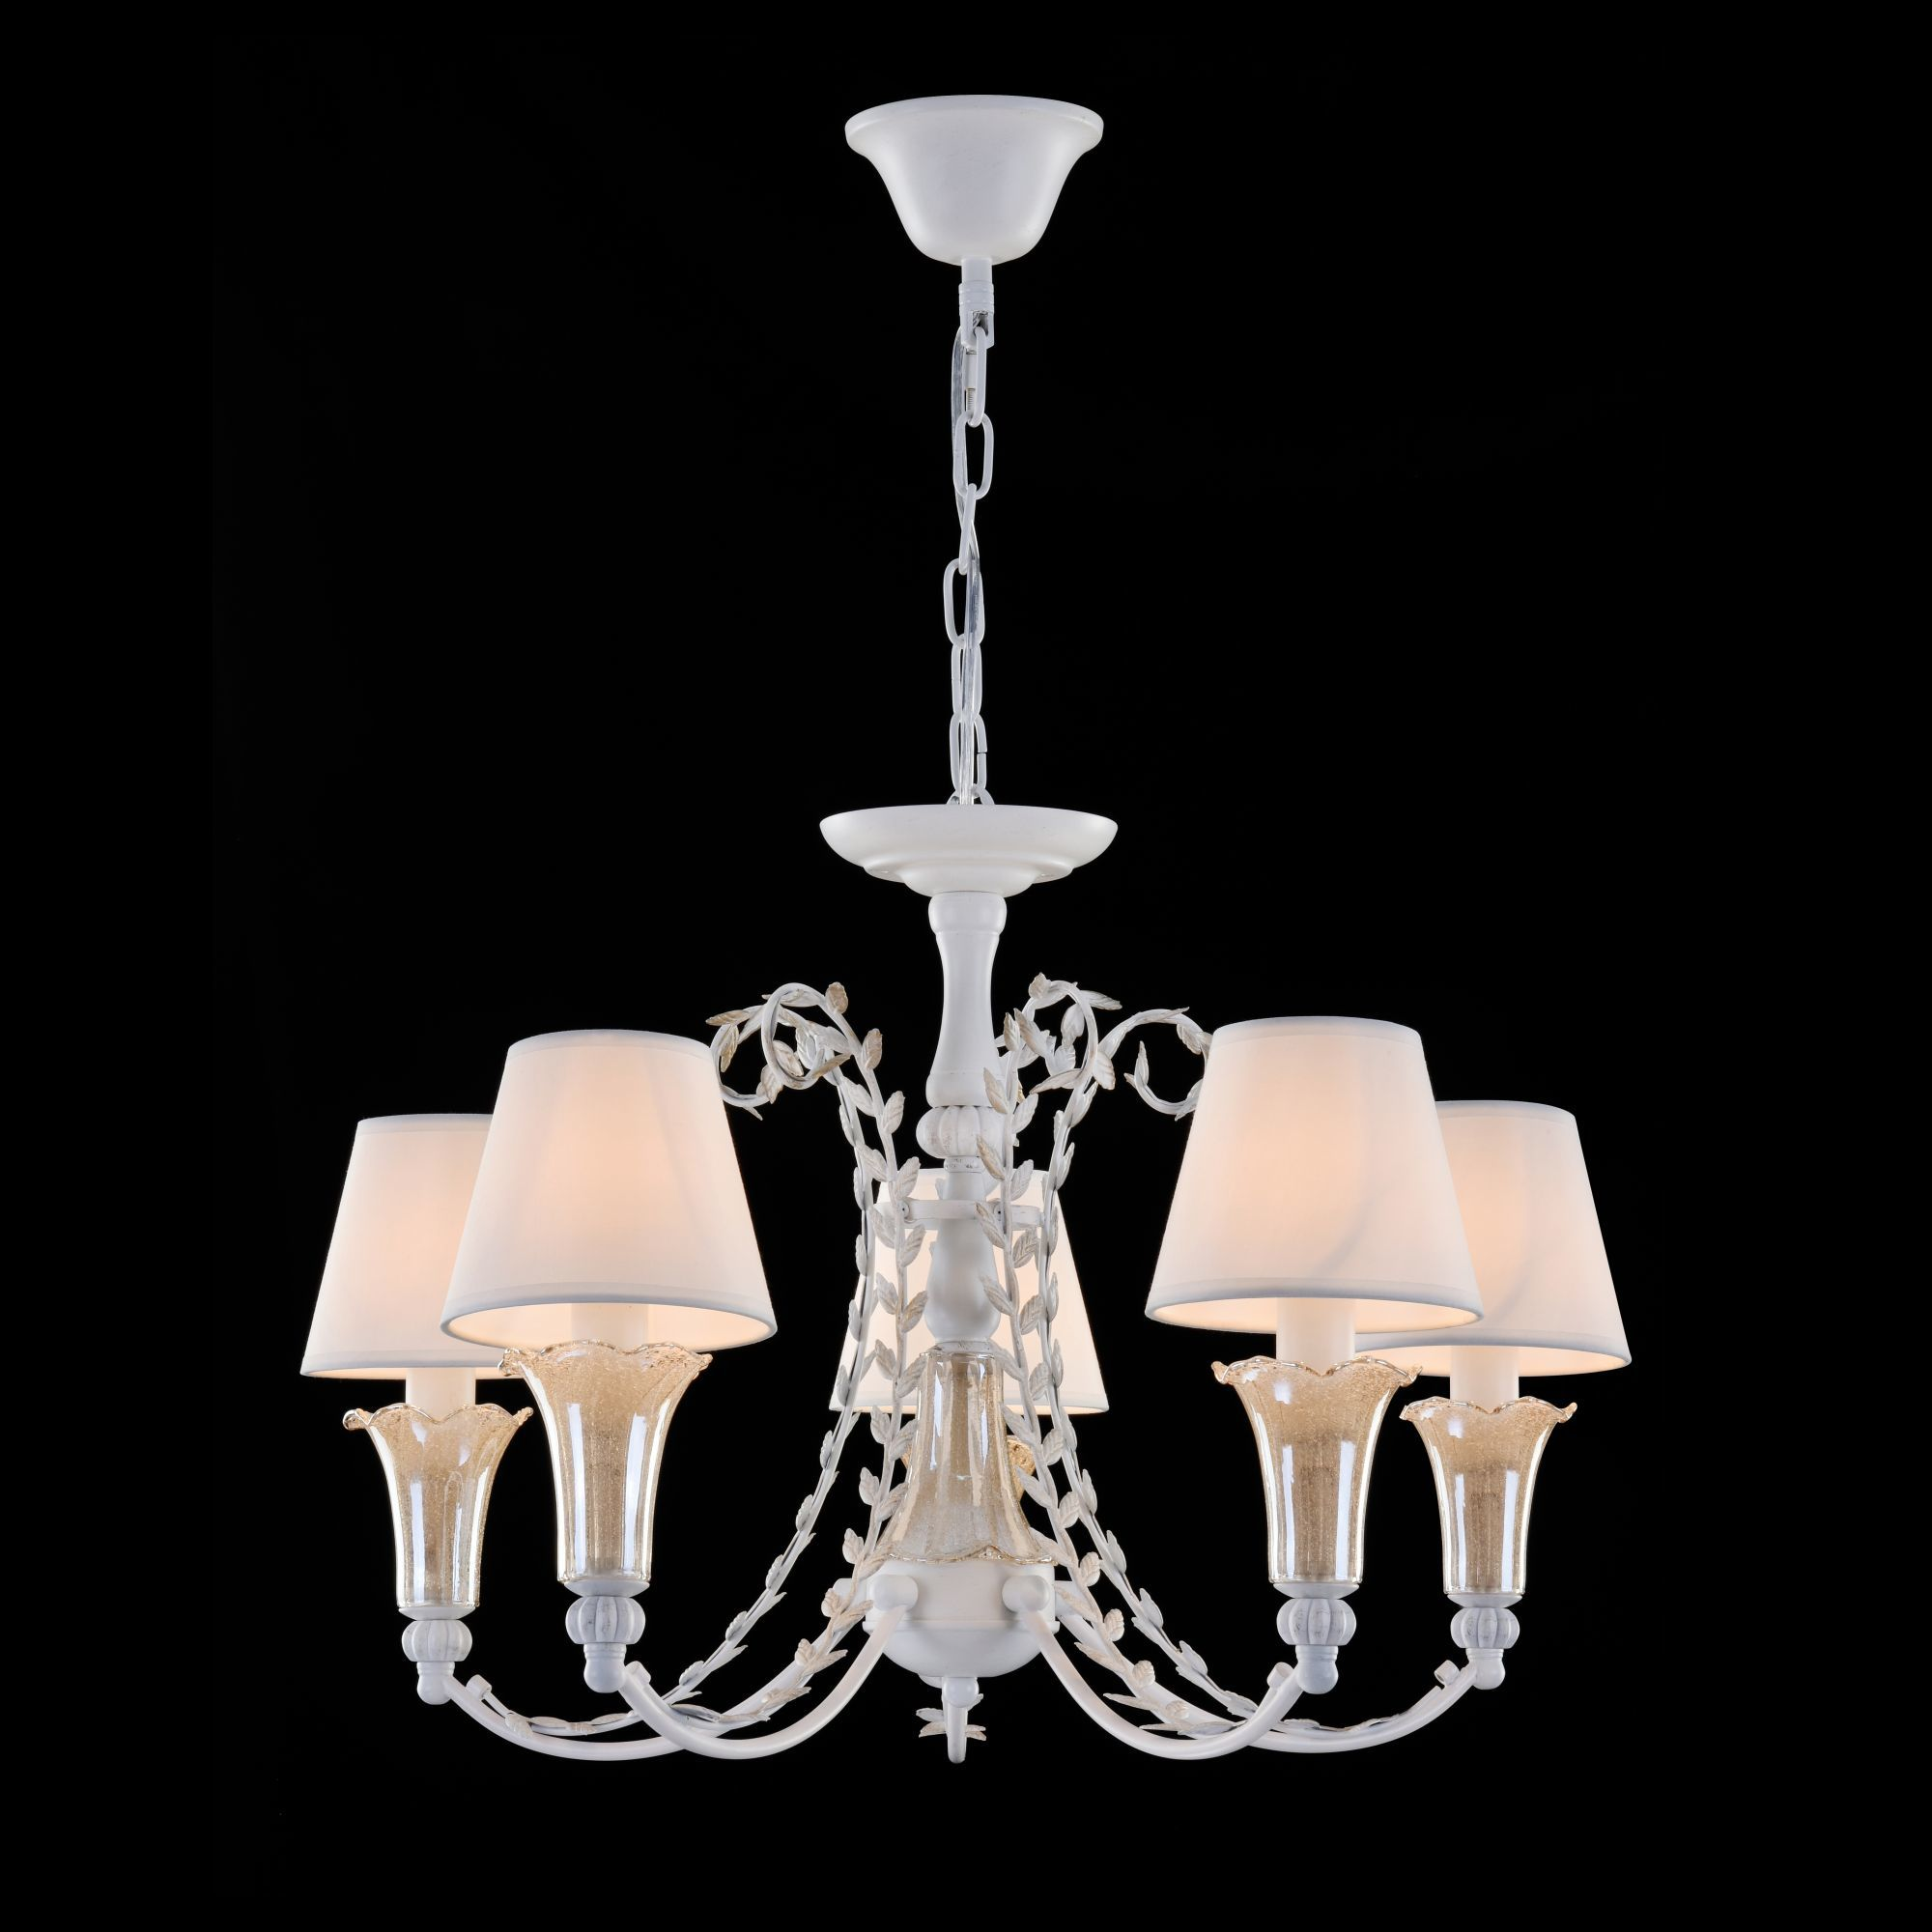 Подвесная люстра Freya Alessa FR2984-PL-05-W, 5xE14x60W, белый, янтарь, металл, стекло, текстиль - фото 3